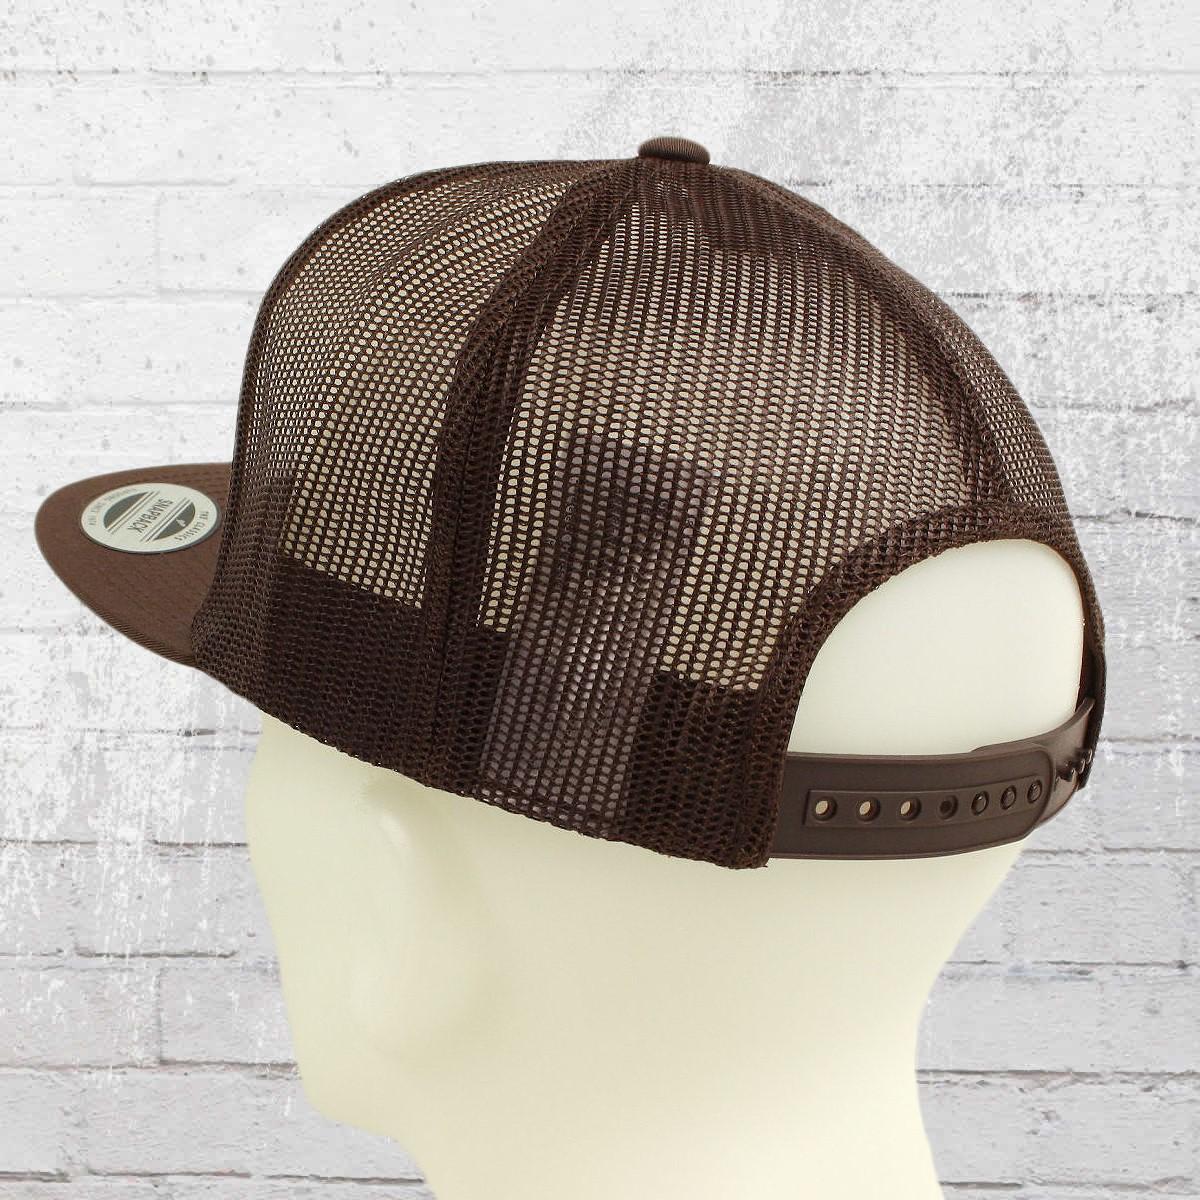 Have you seen  Yupoong Flexfit Classic Trucker Hat Snapback Mesh Cap black  white black 3b6c4b2ff735